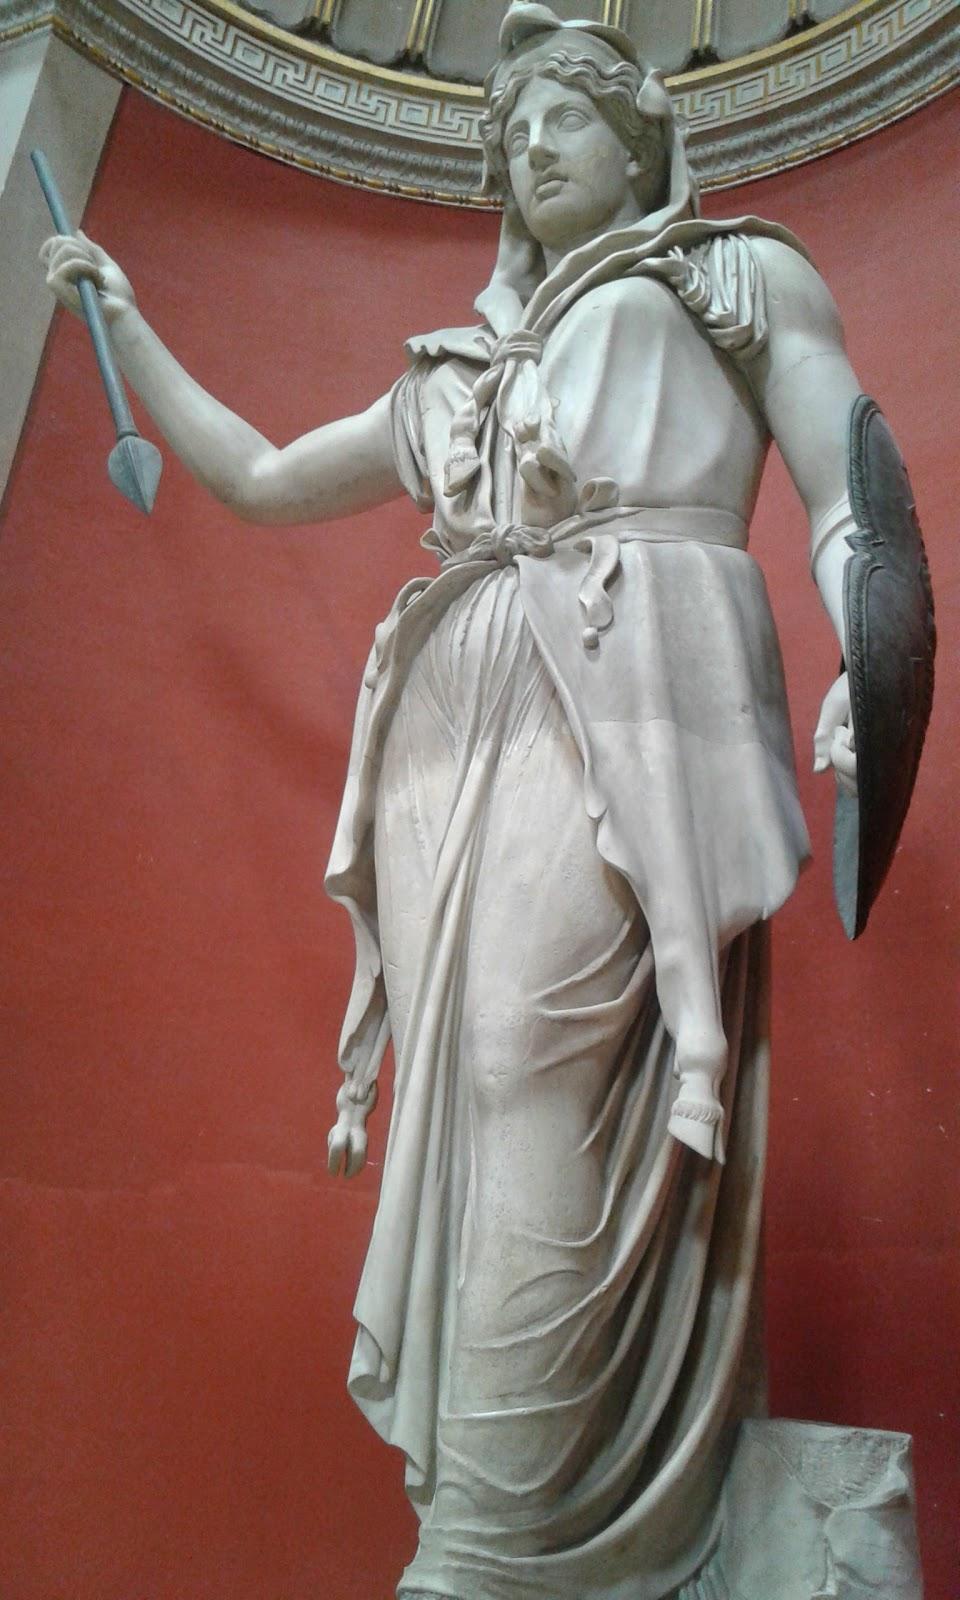 capela sistina, cultura, história, michelangelo, musei vaticani, museu, sistina, vaticano, roma, itália,